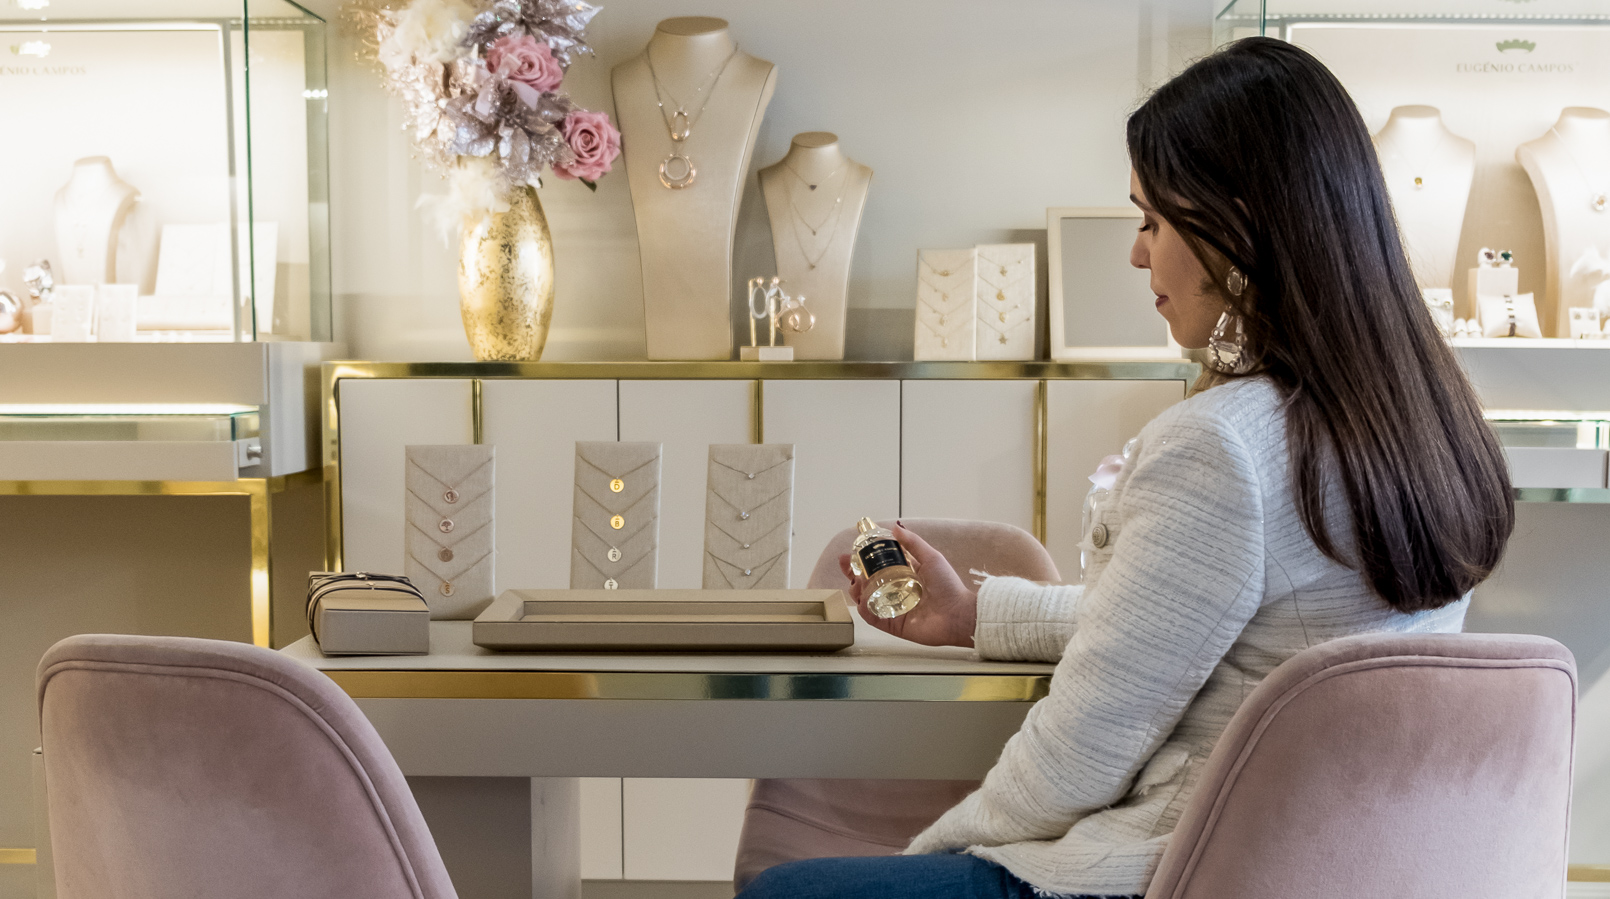 Le Fashionaire Eugénio Campos: as jóias que contam histórias eugenio campos joias loja casaco branco tweed zara 3990F PT